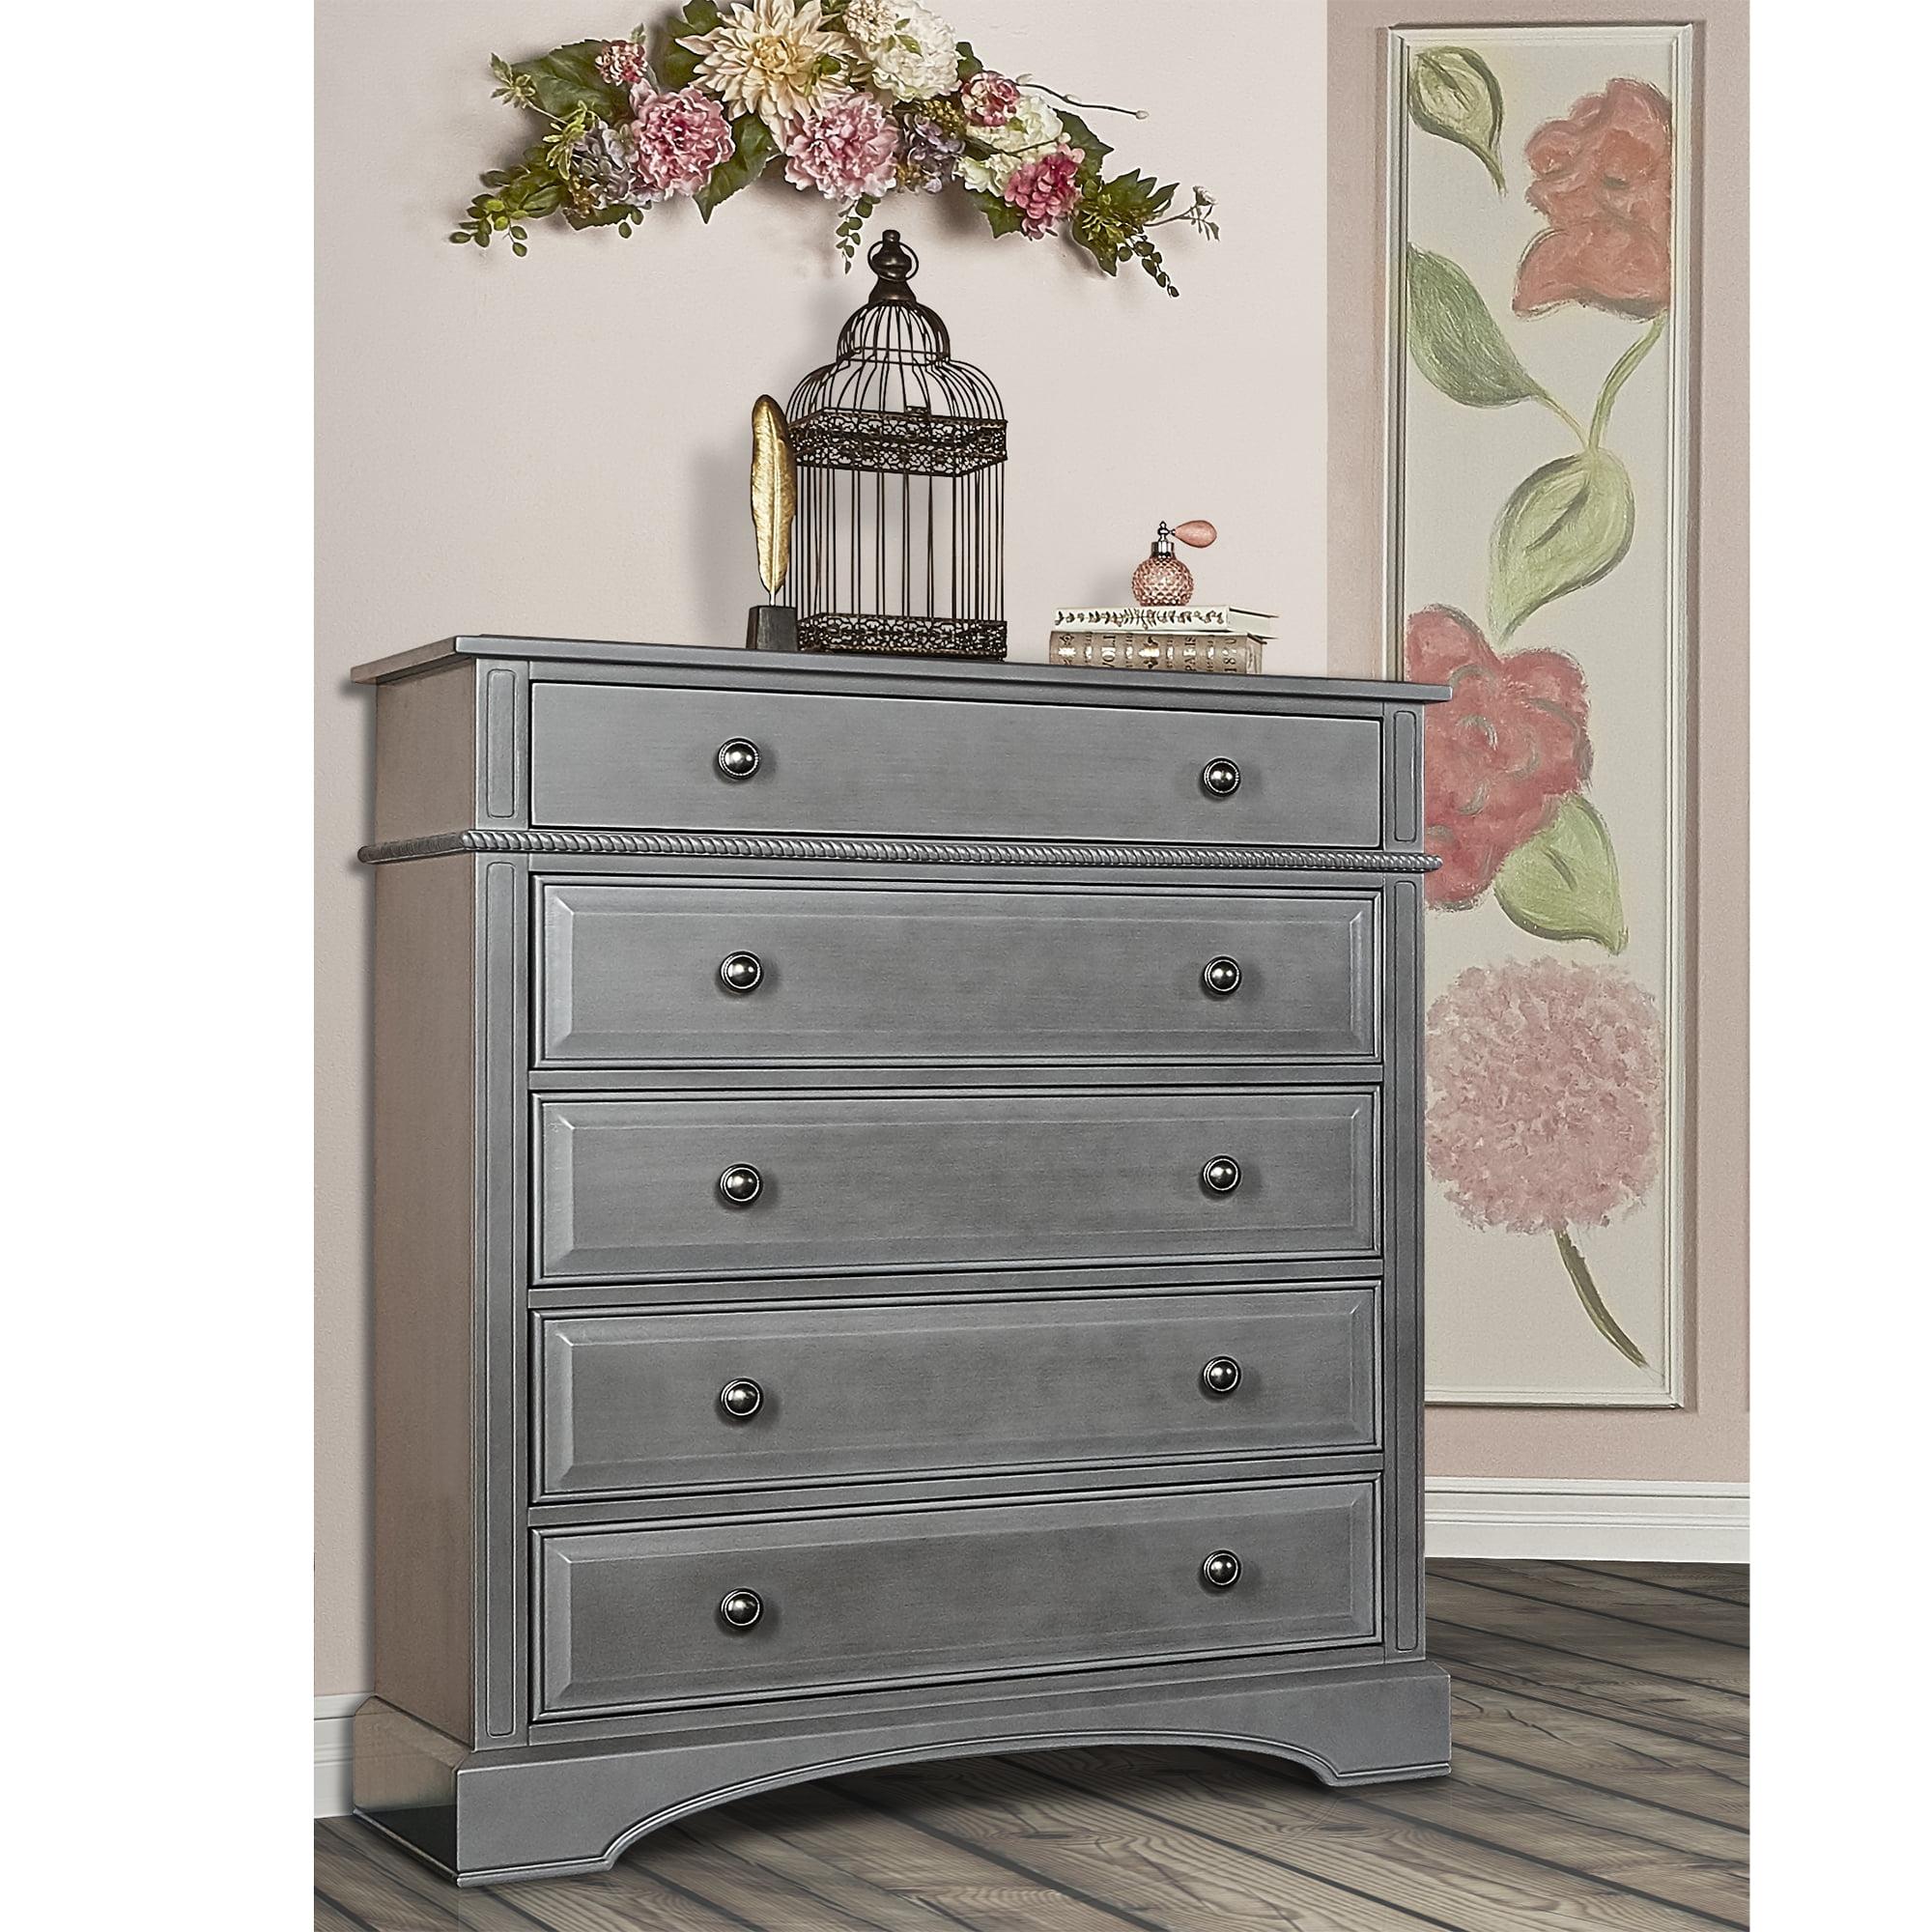 Evolur 5 Drawer Dresser, Choose Your Finish by Evolur